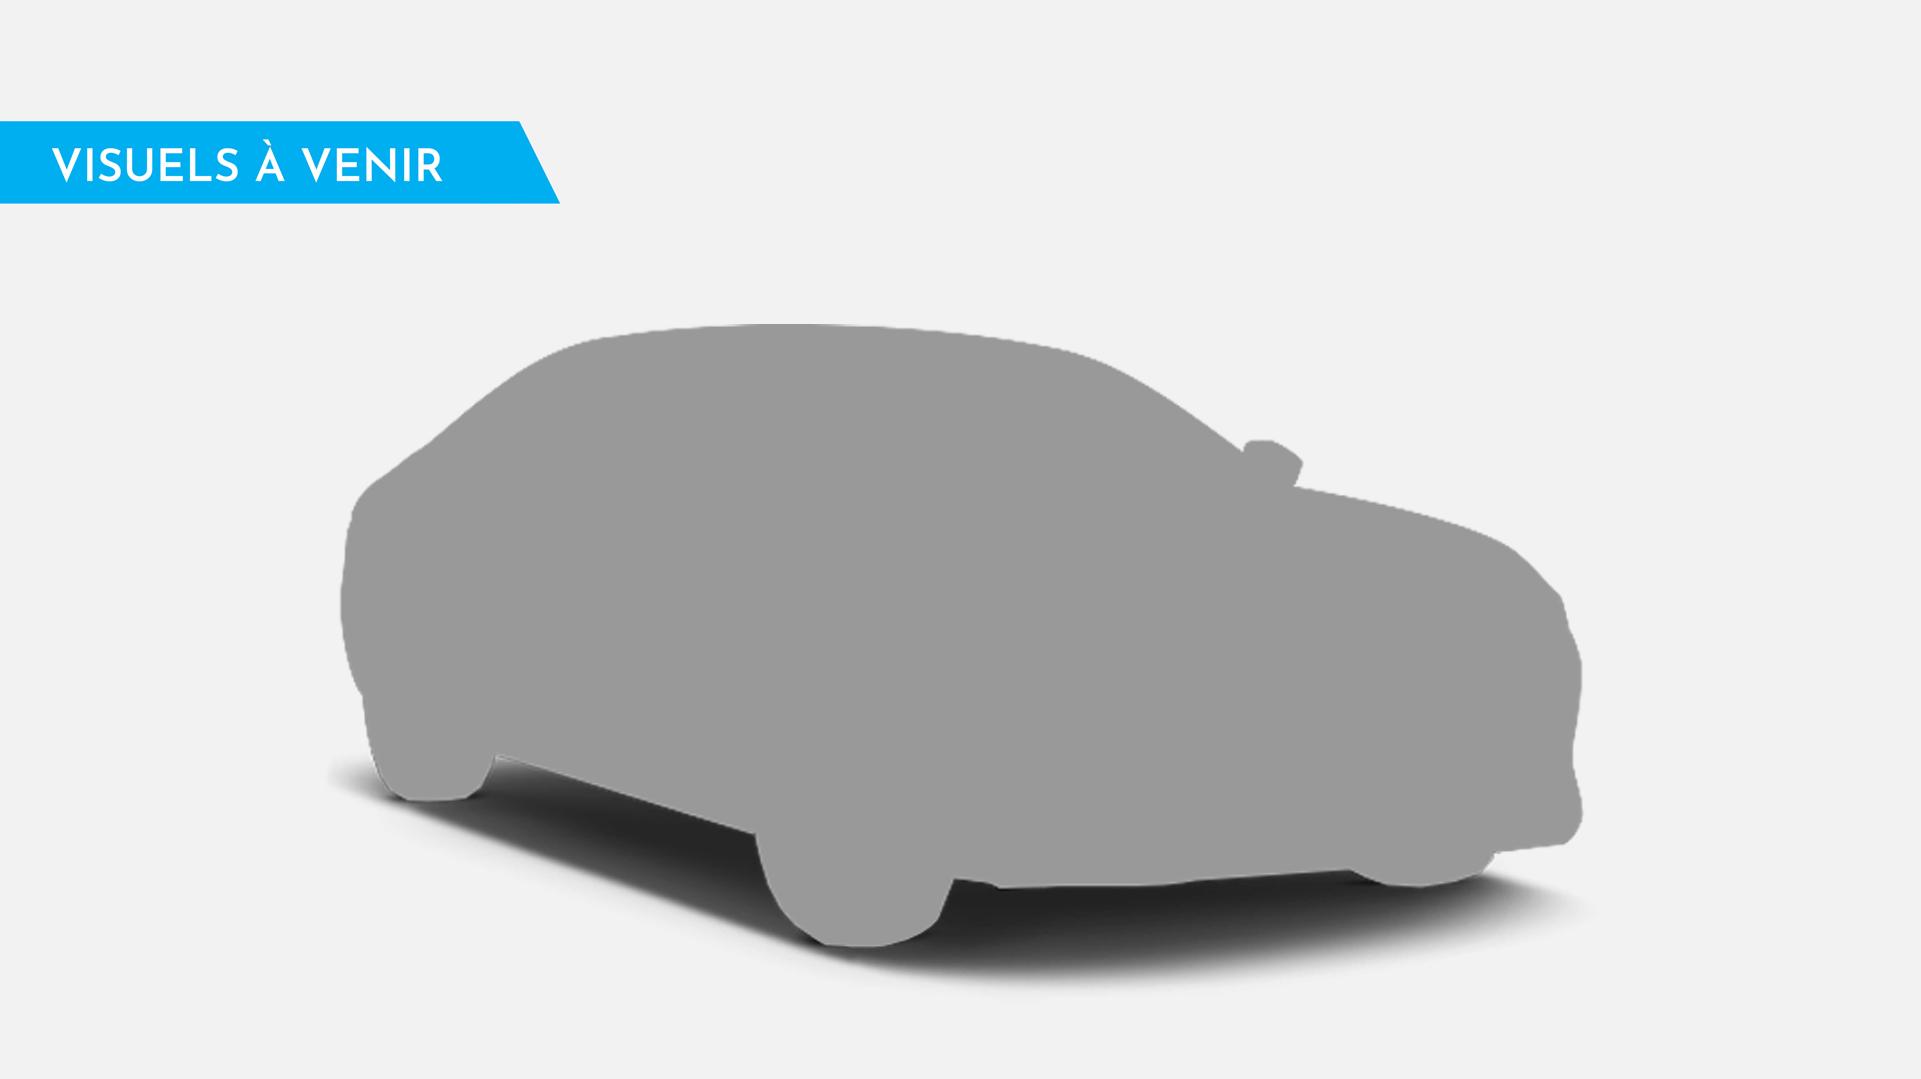 volkswagen golf sportsvan 2 0 tdi 150ch bluemotion. Black Bedroom Furniture Sets. Home Design Ideas